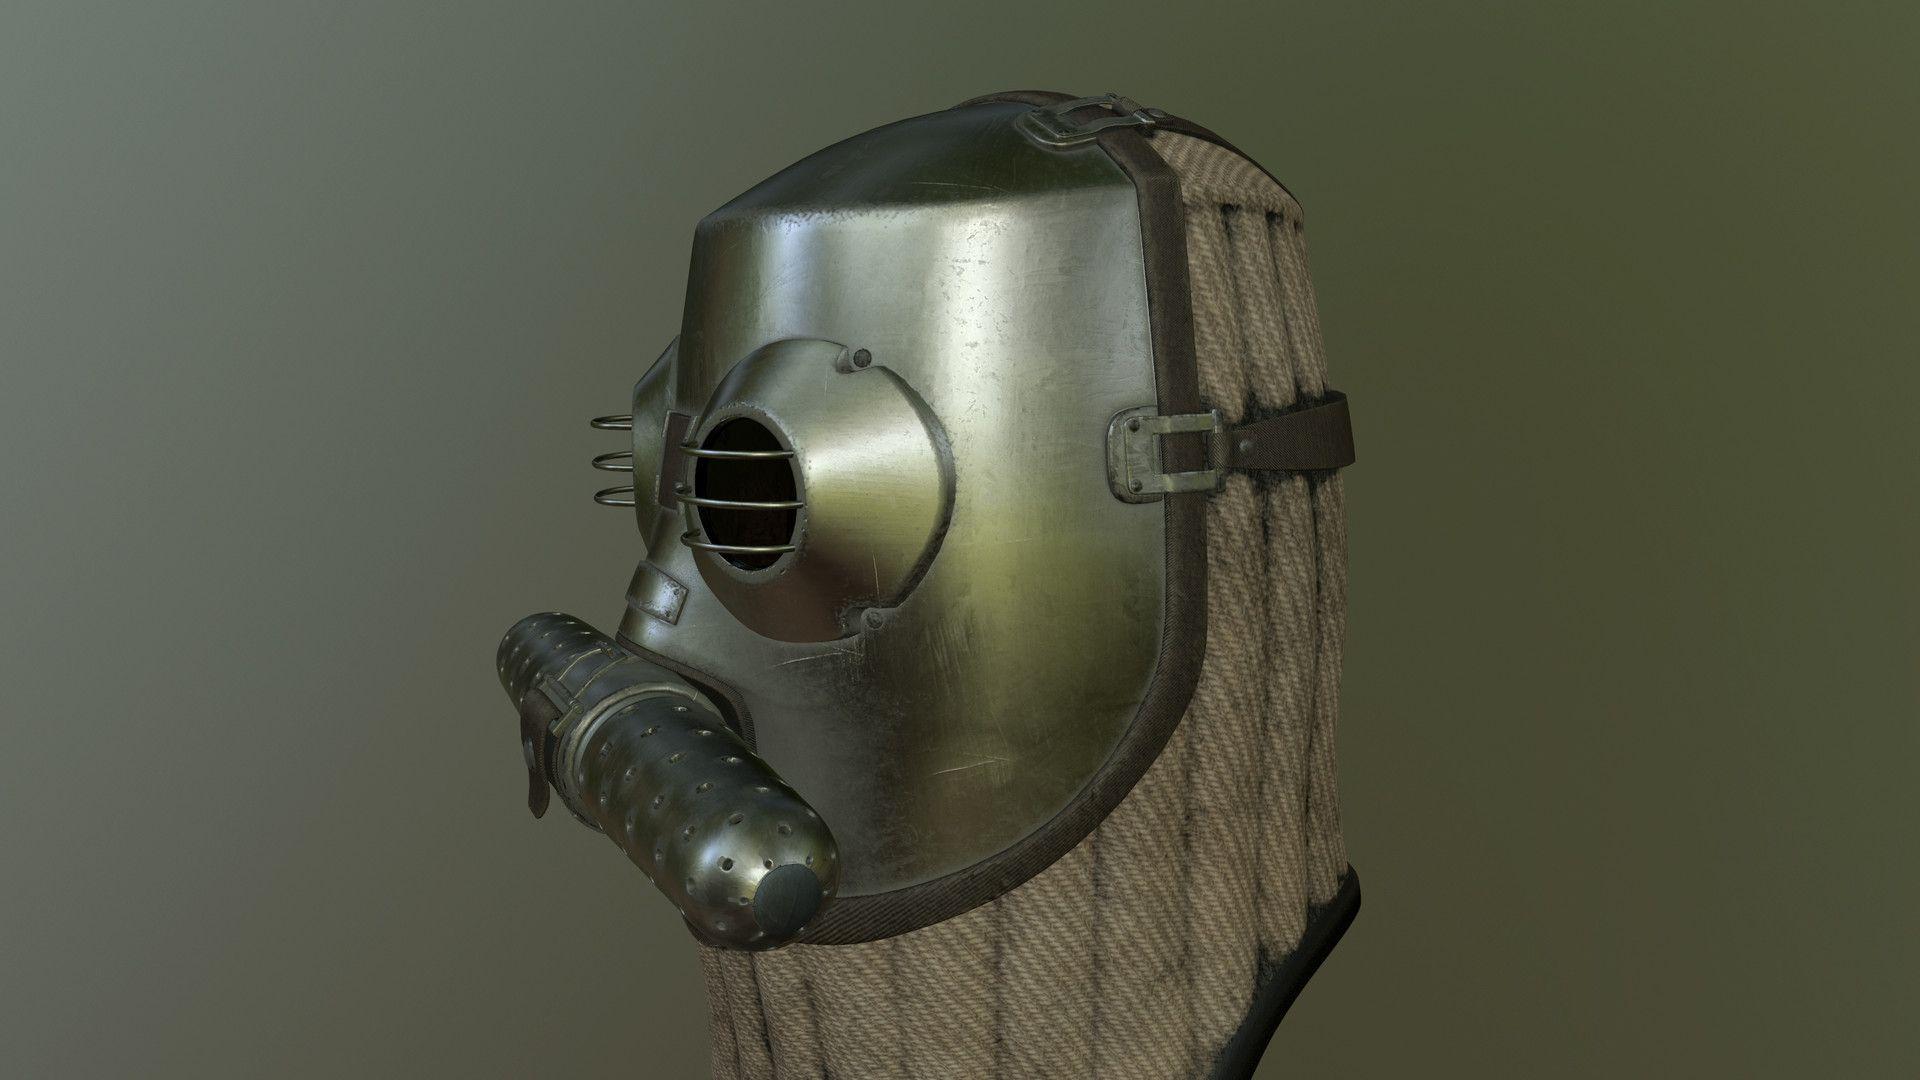 ArtStation - Gas Mask, Alexandre Dupont